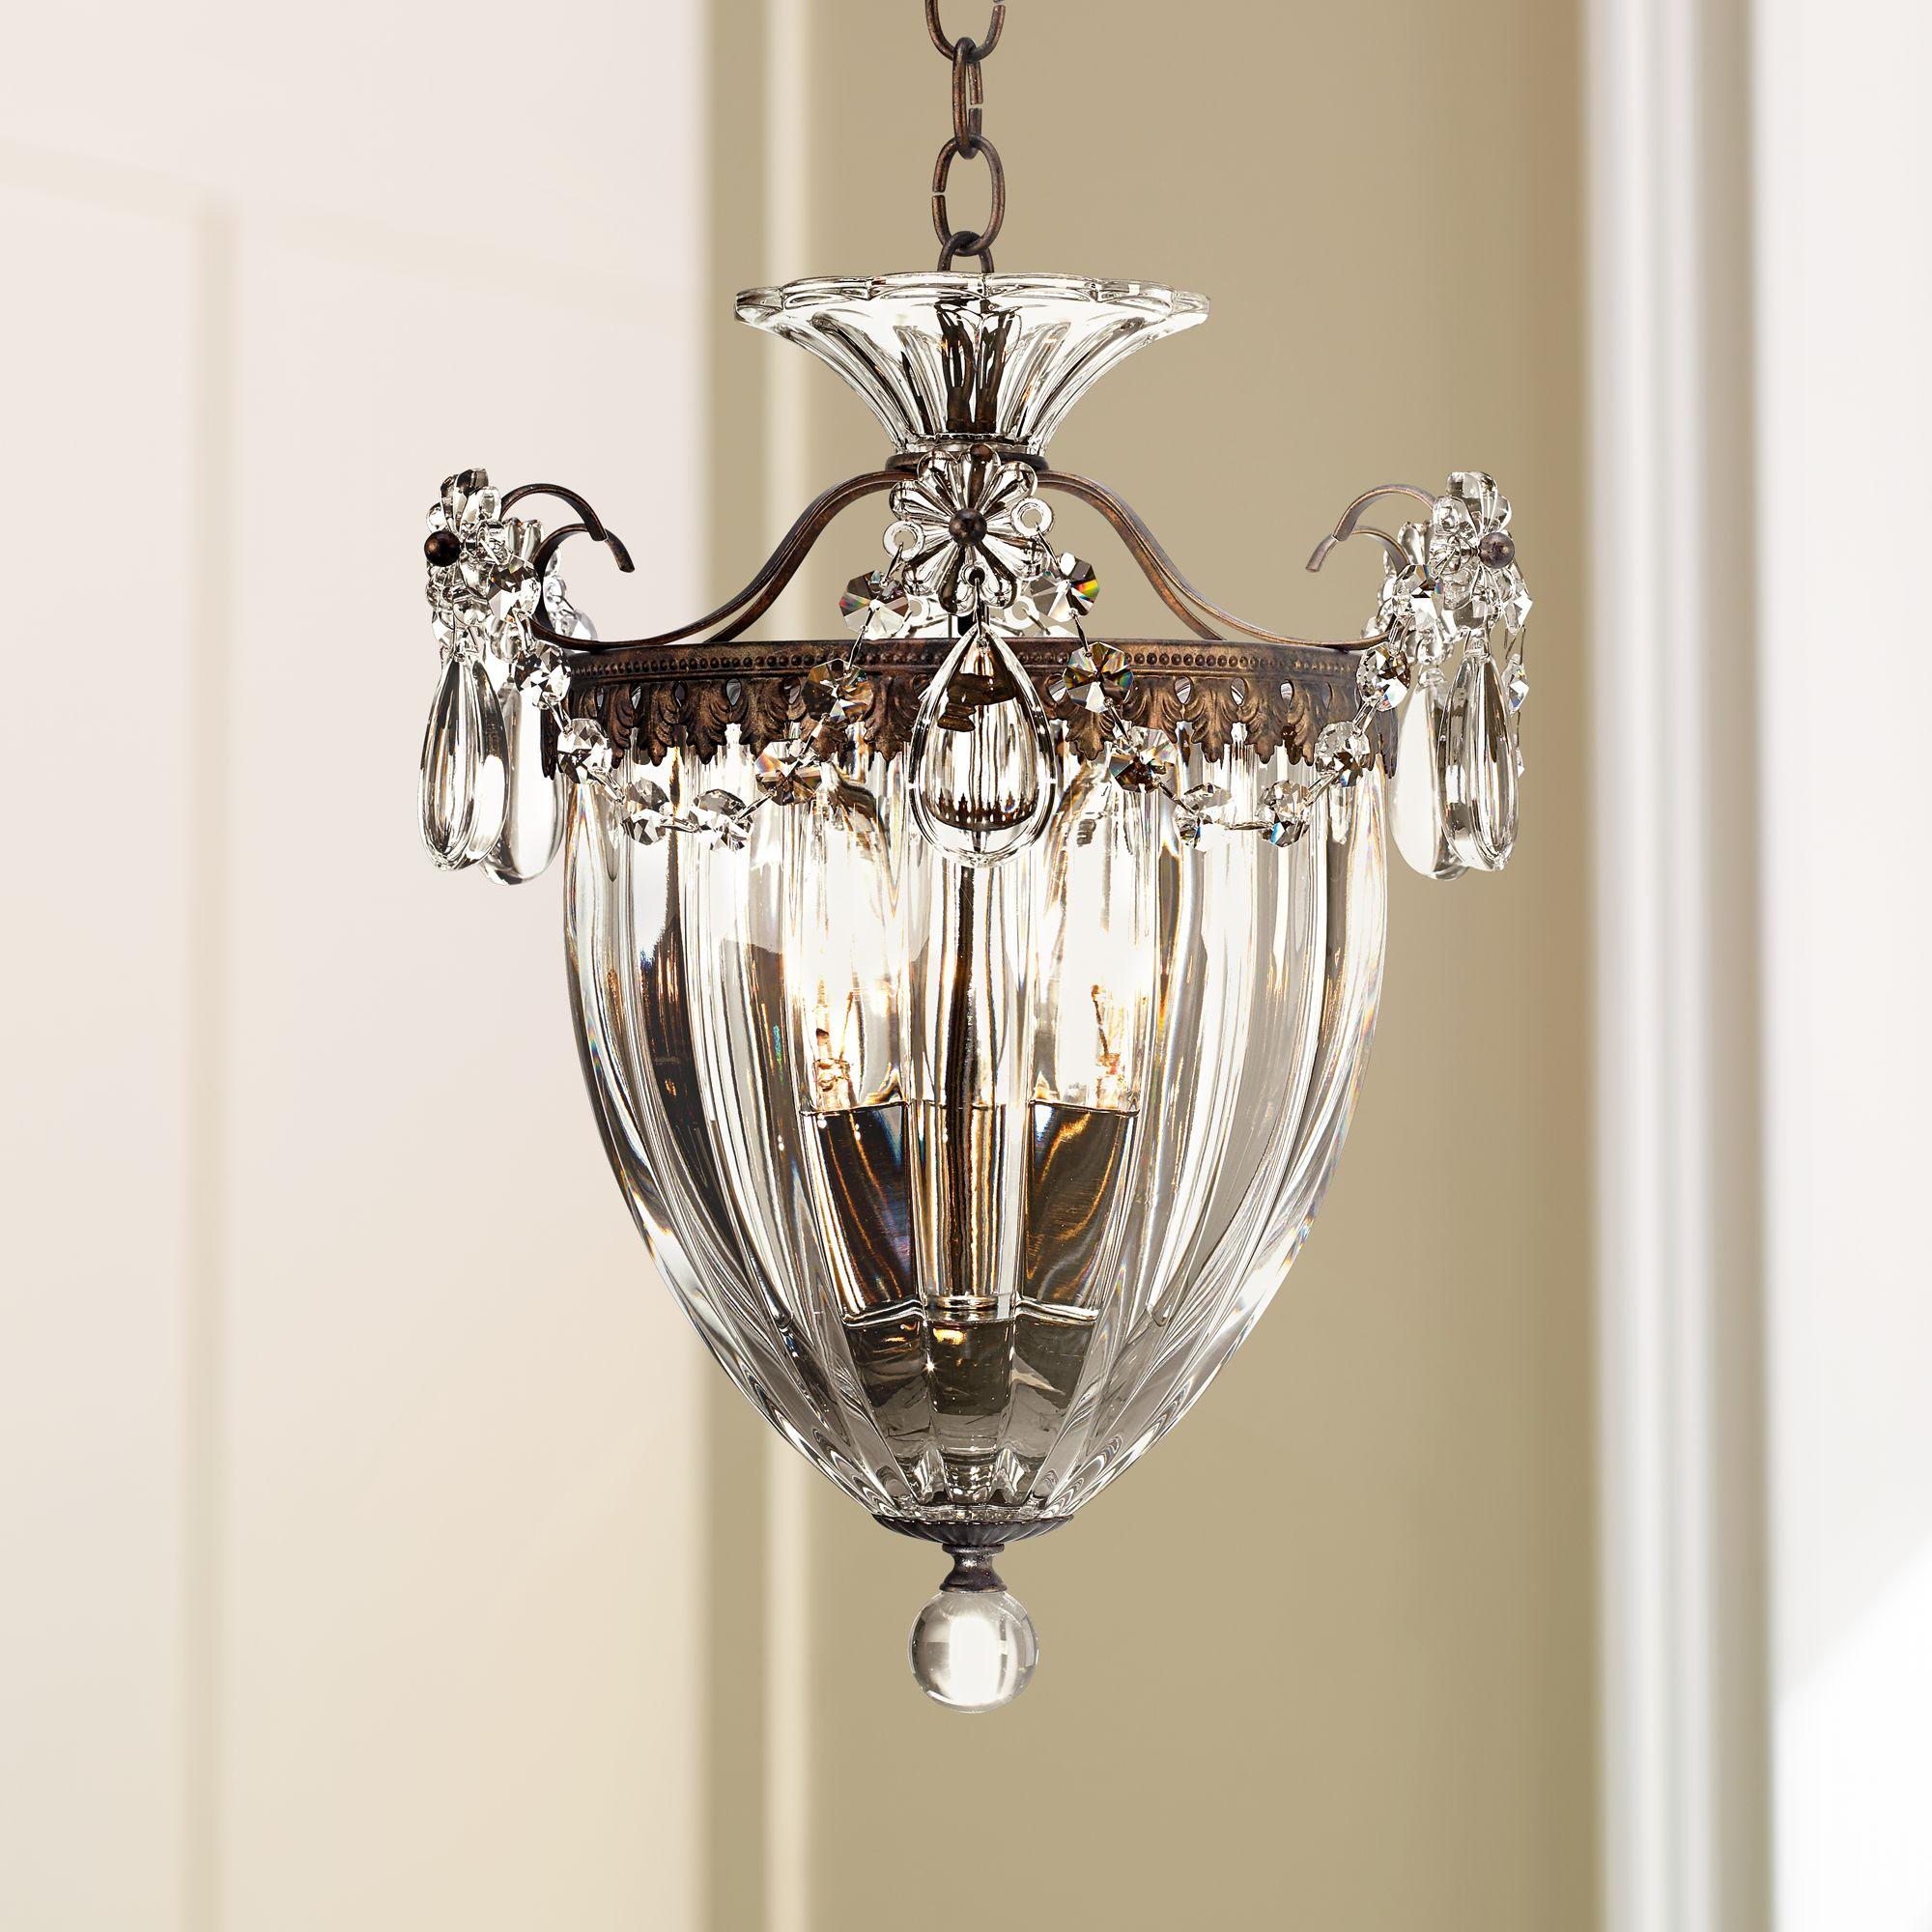 bathroom chandeliers schonbek bagatelle collection 10 1/2 BEJWALC